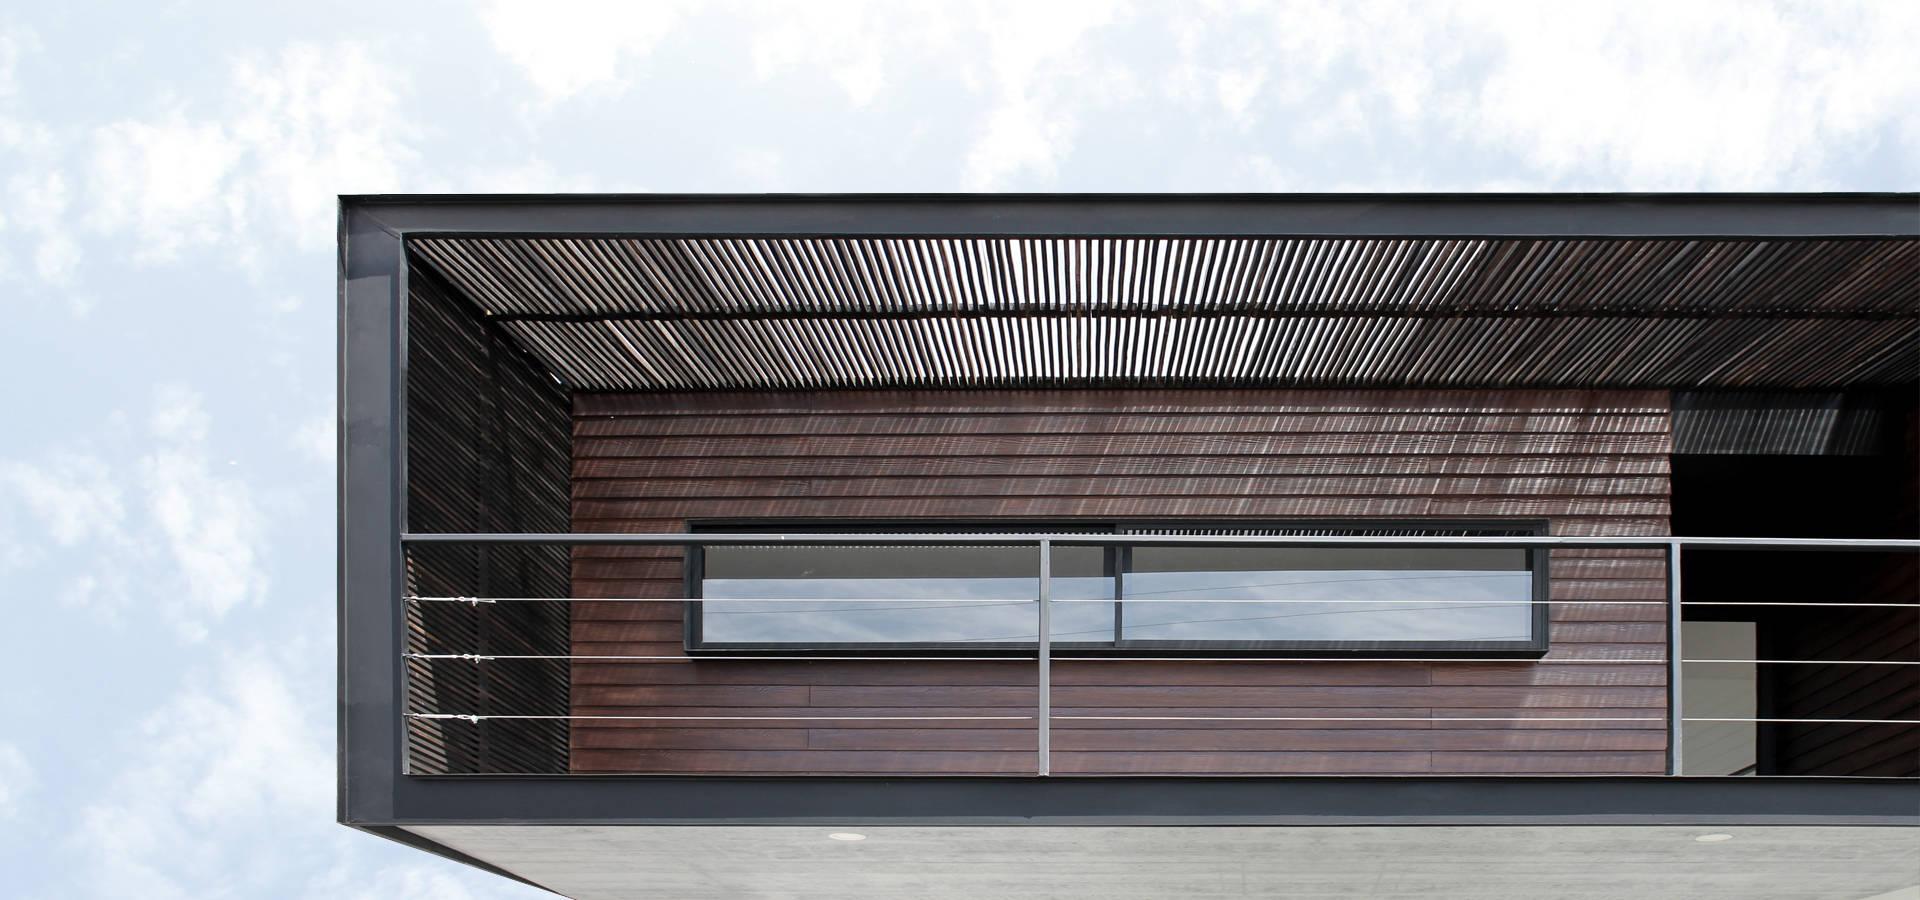 Landeros & Charles Architects